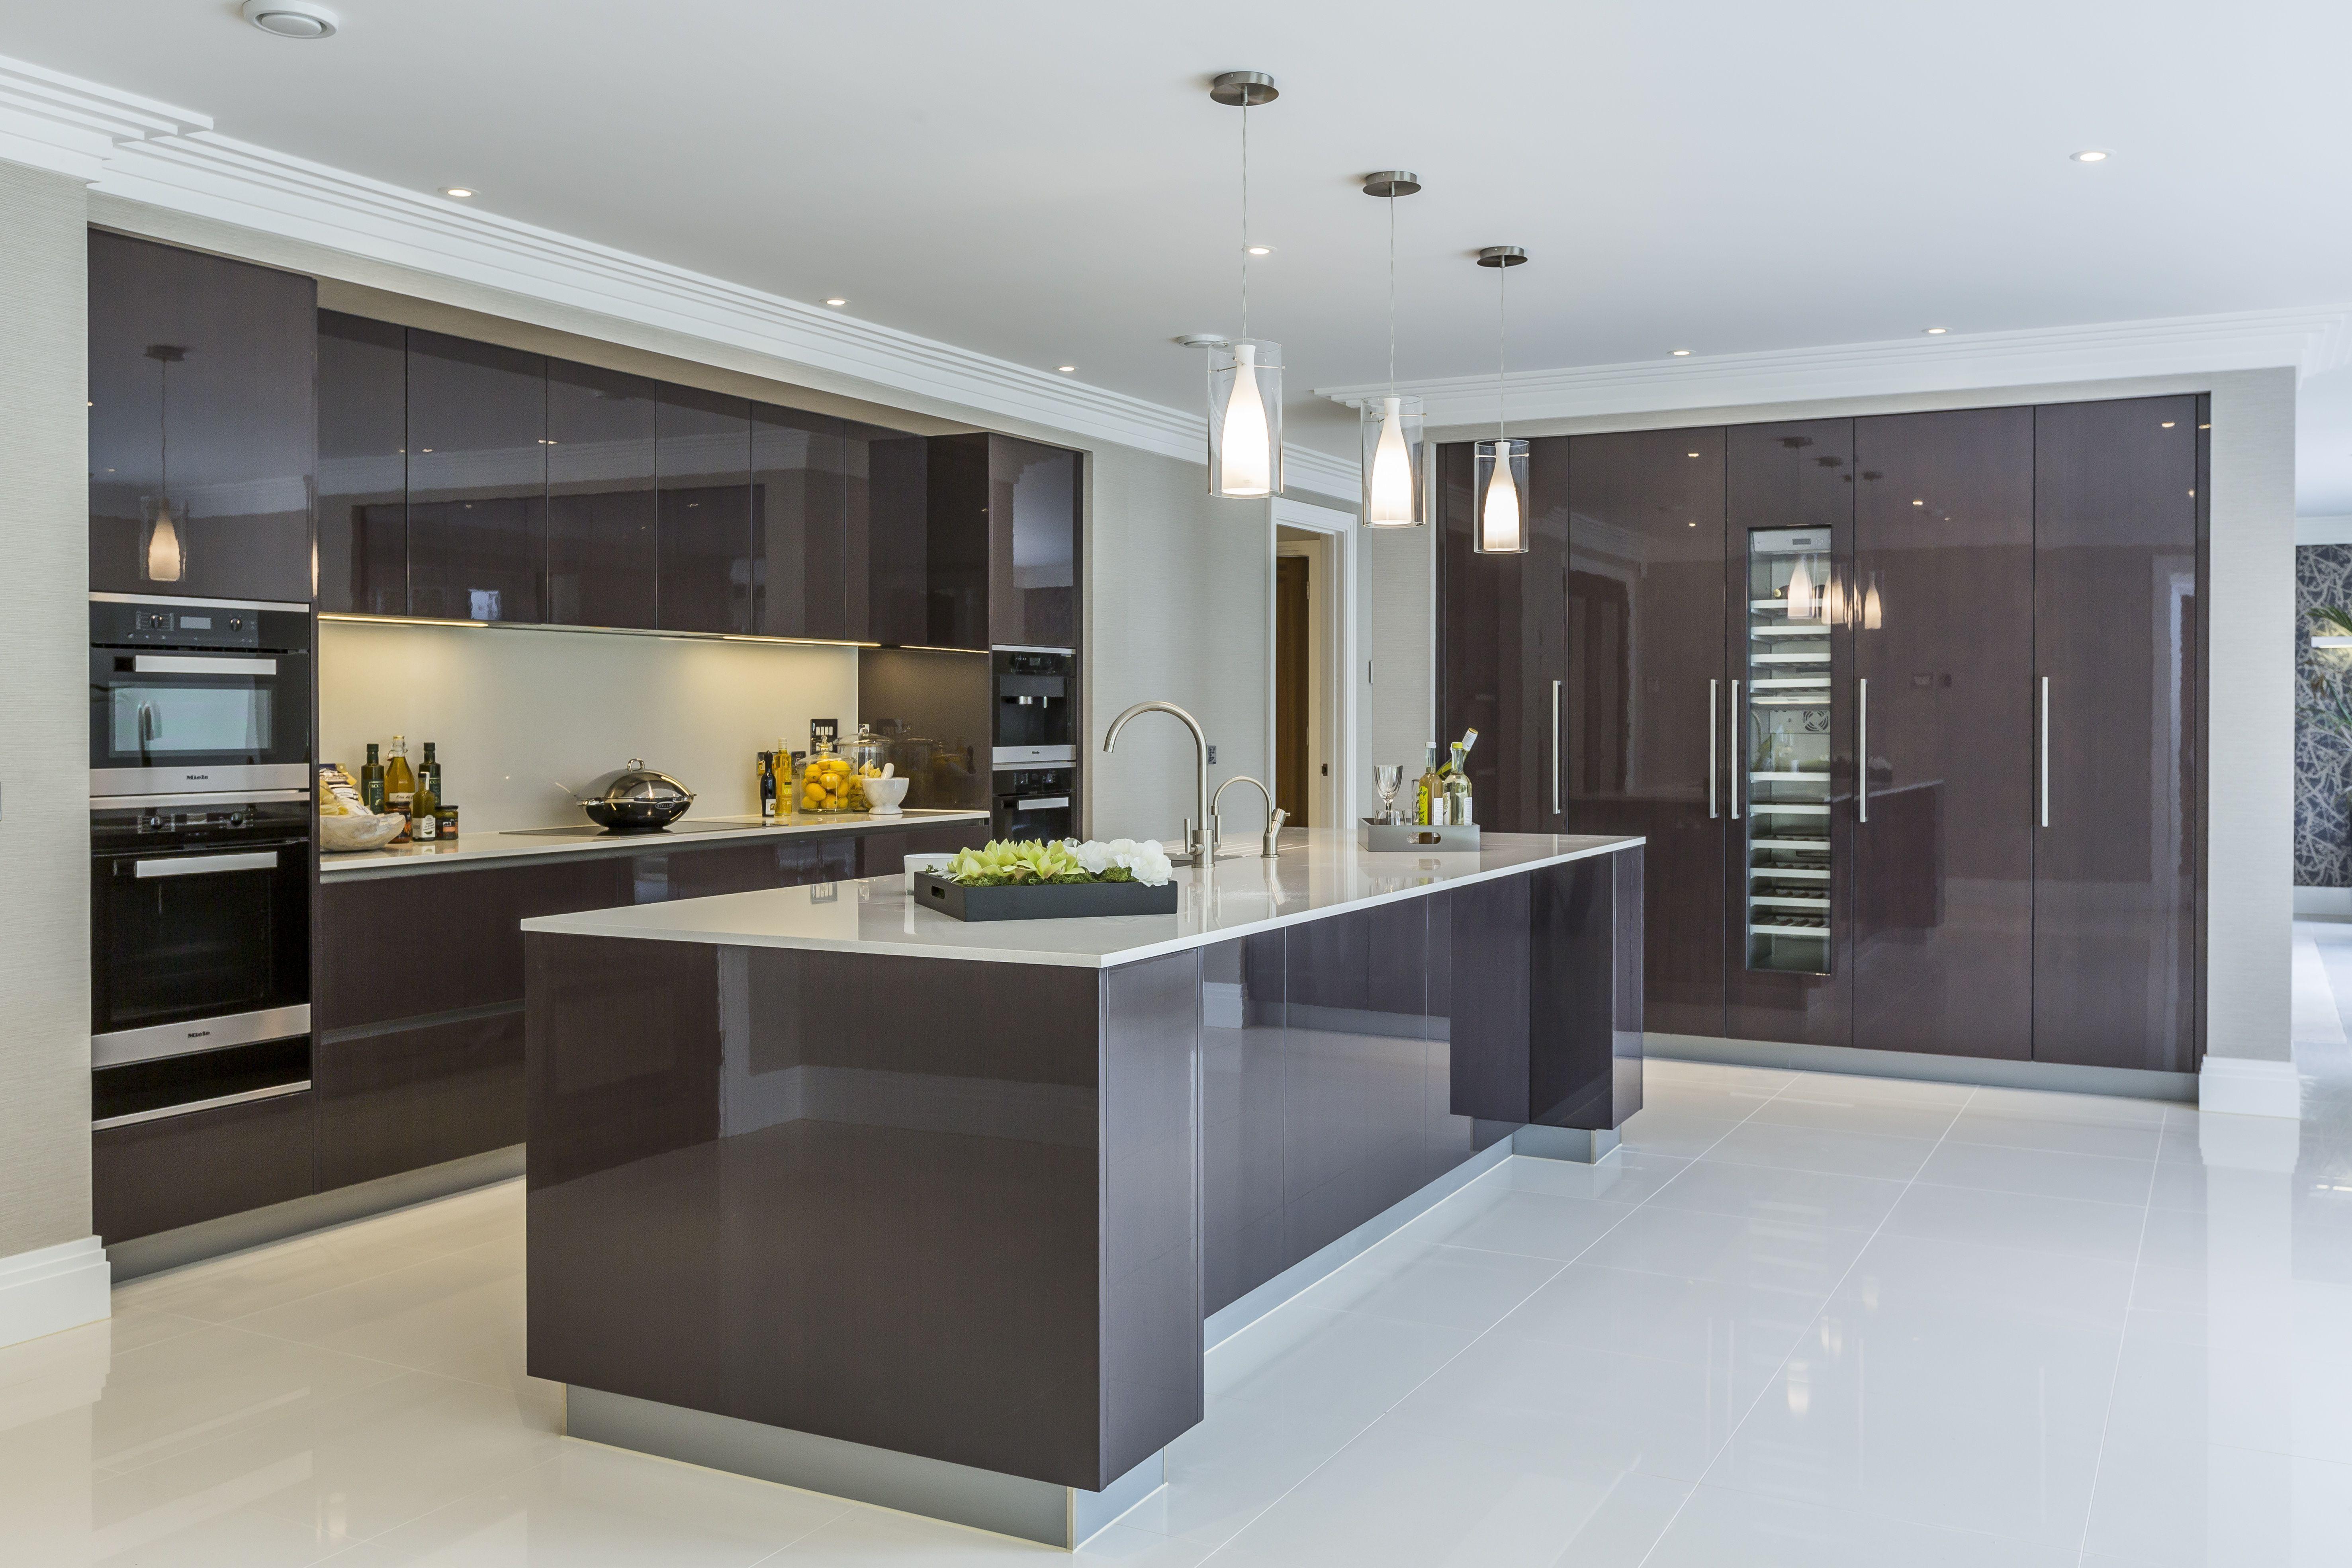 Extreme Contemporary Minimal High Gloss Kitchen Design In Private Mansion Modernkitchendesi Modern Kitchen Design Luxury Kitchens Contemporary Kitchen Design